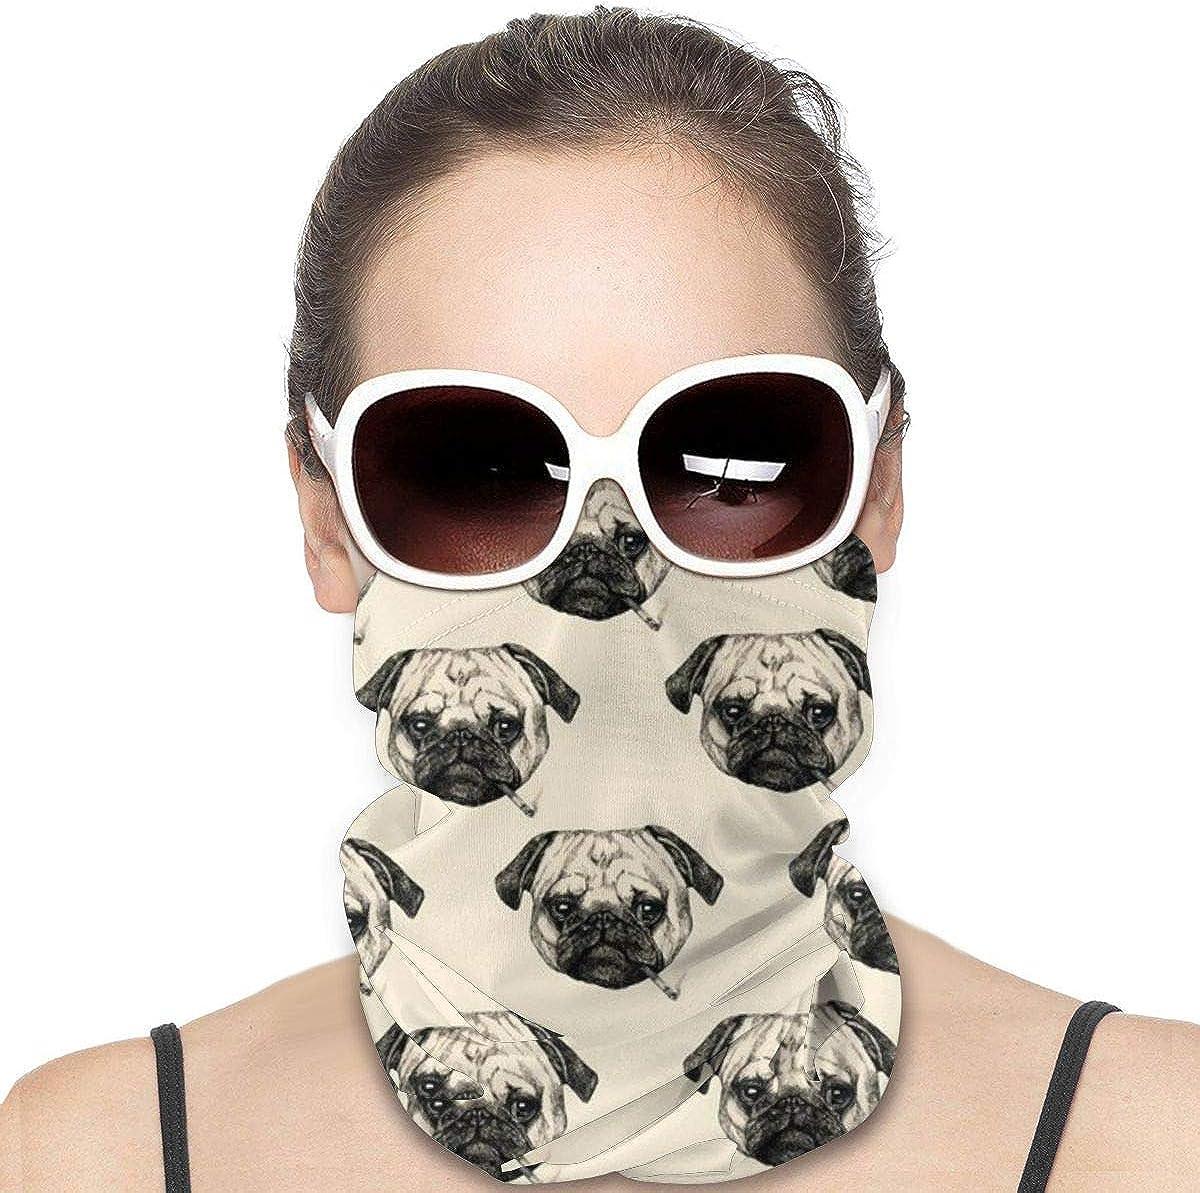 Britain Customs Neck Warmer Bandana Balaclava Scarf Mask Beanie Ski Headwear Elastic Breathable Cycling